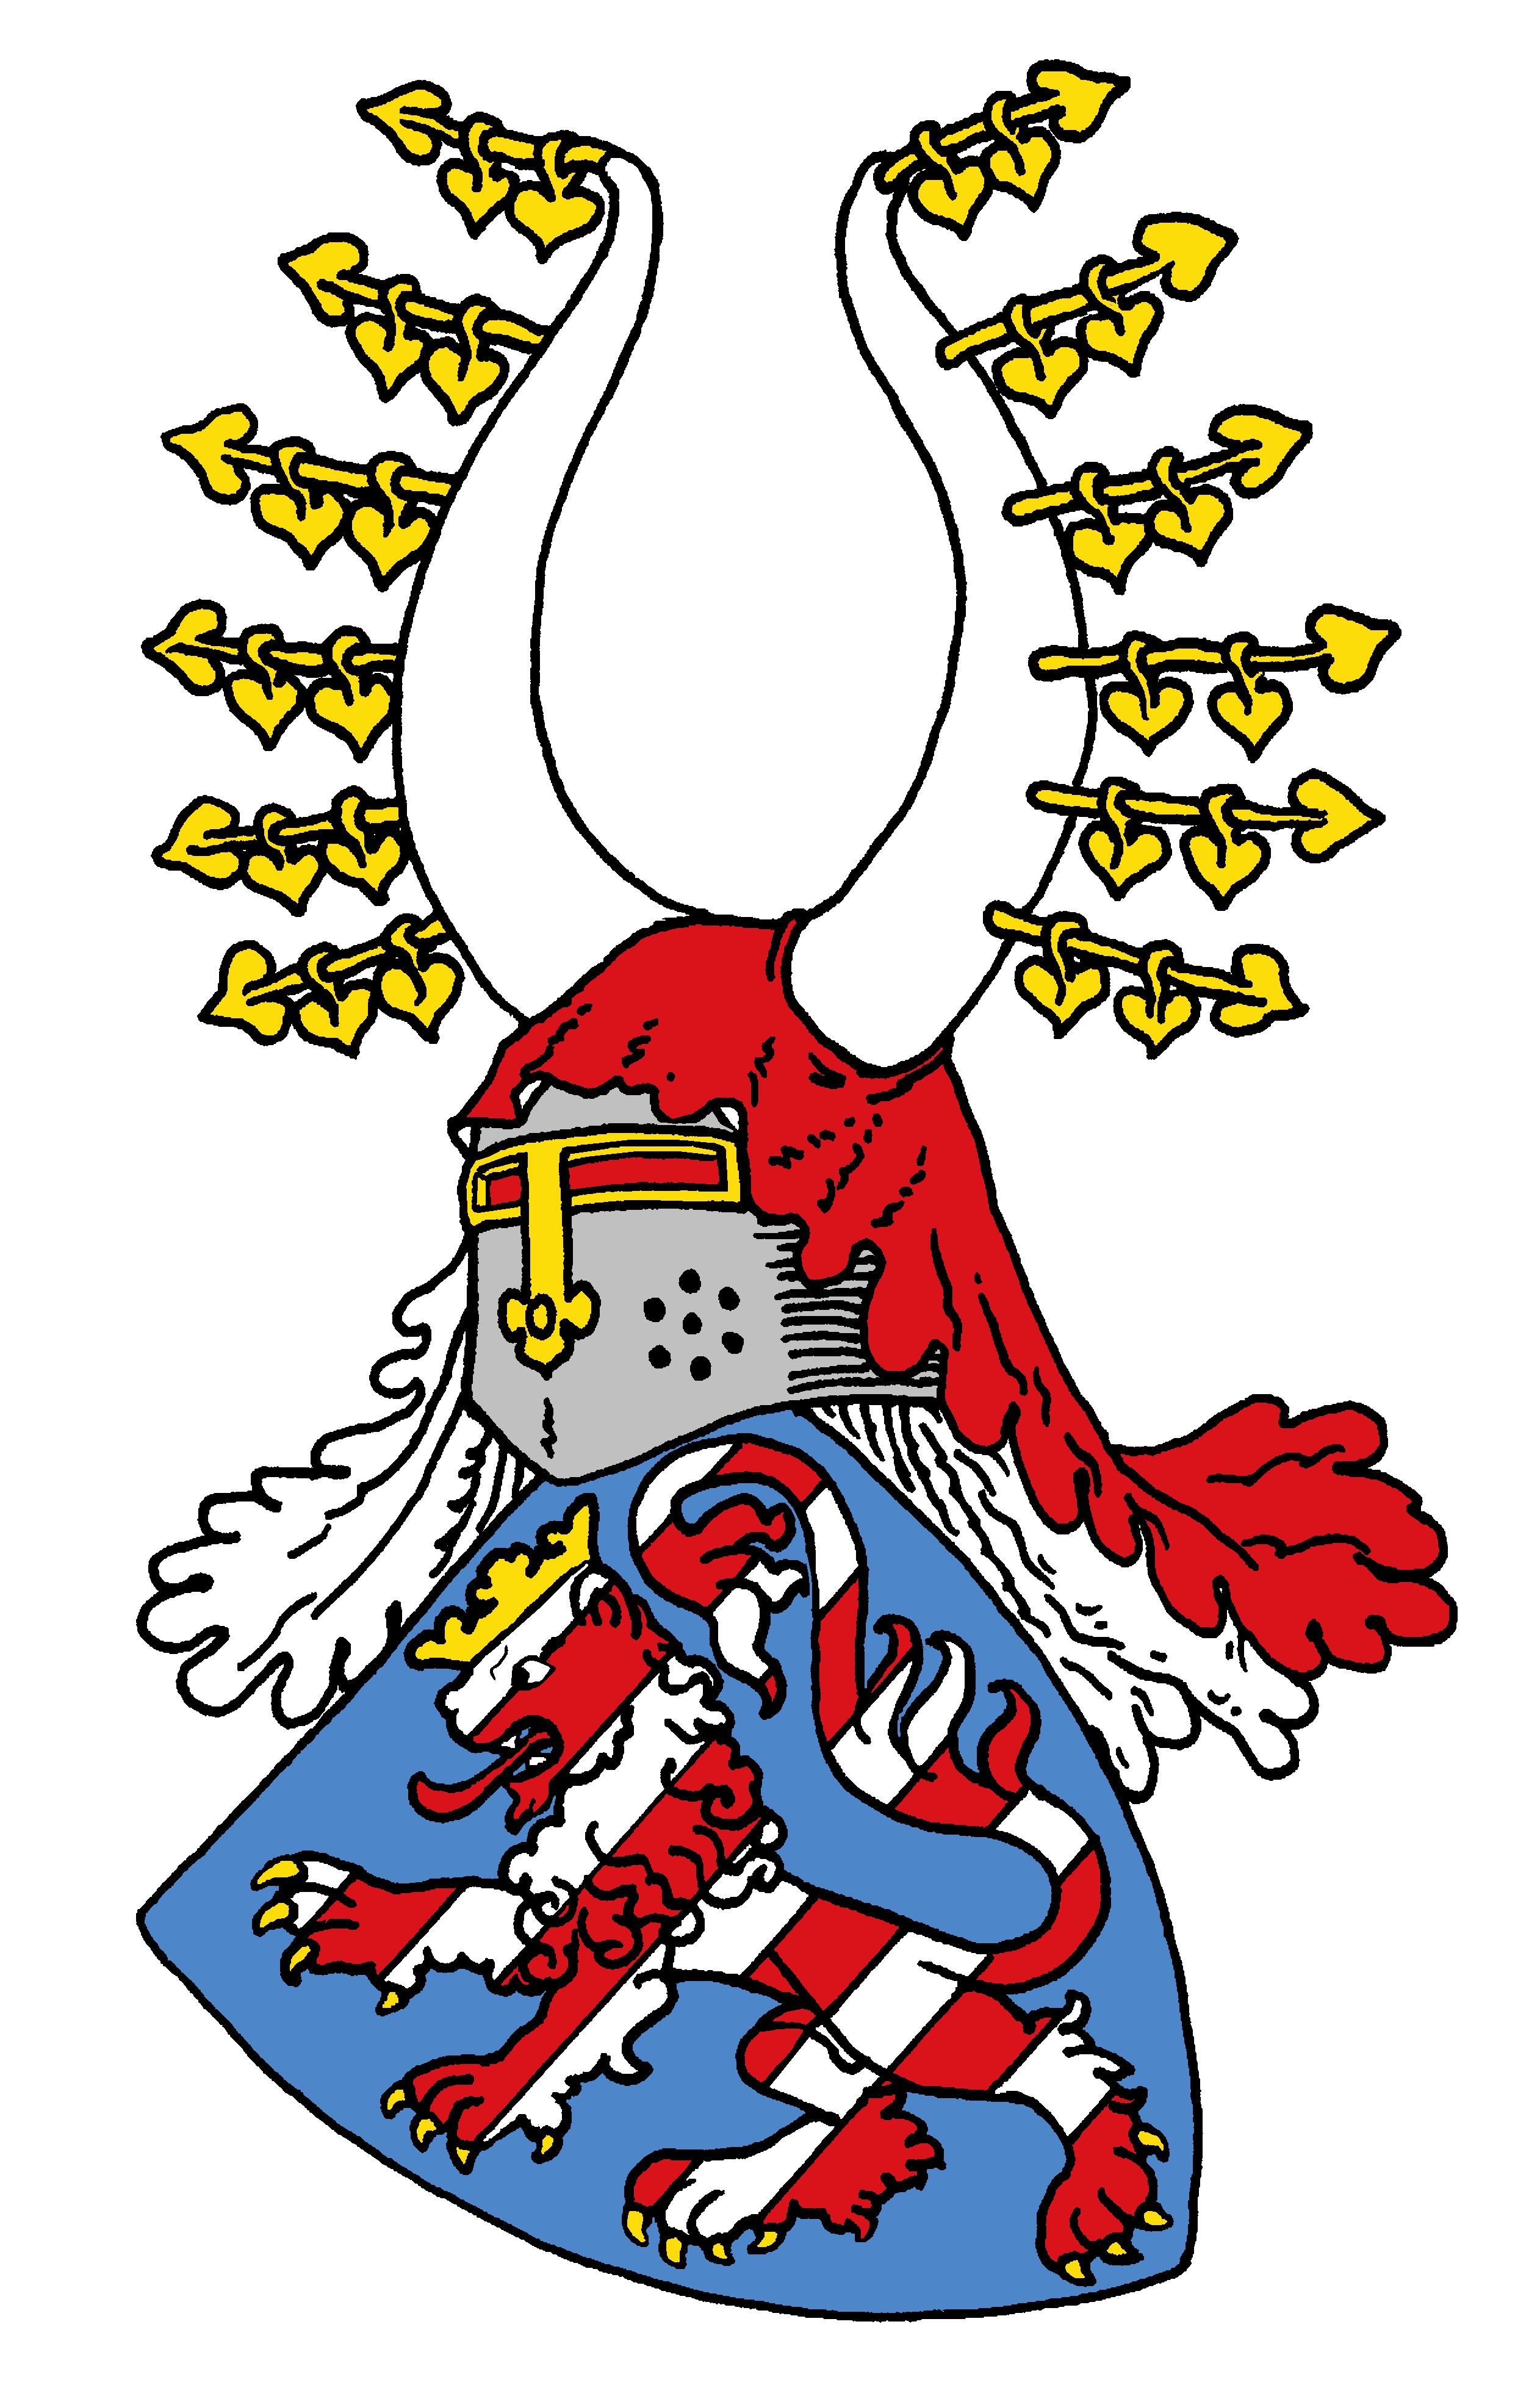 File:Hessen-Wappen.png - Wikimedia Commons